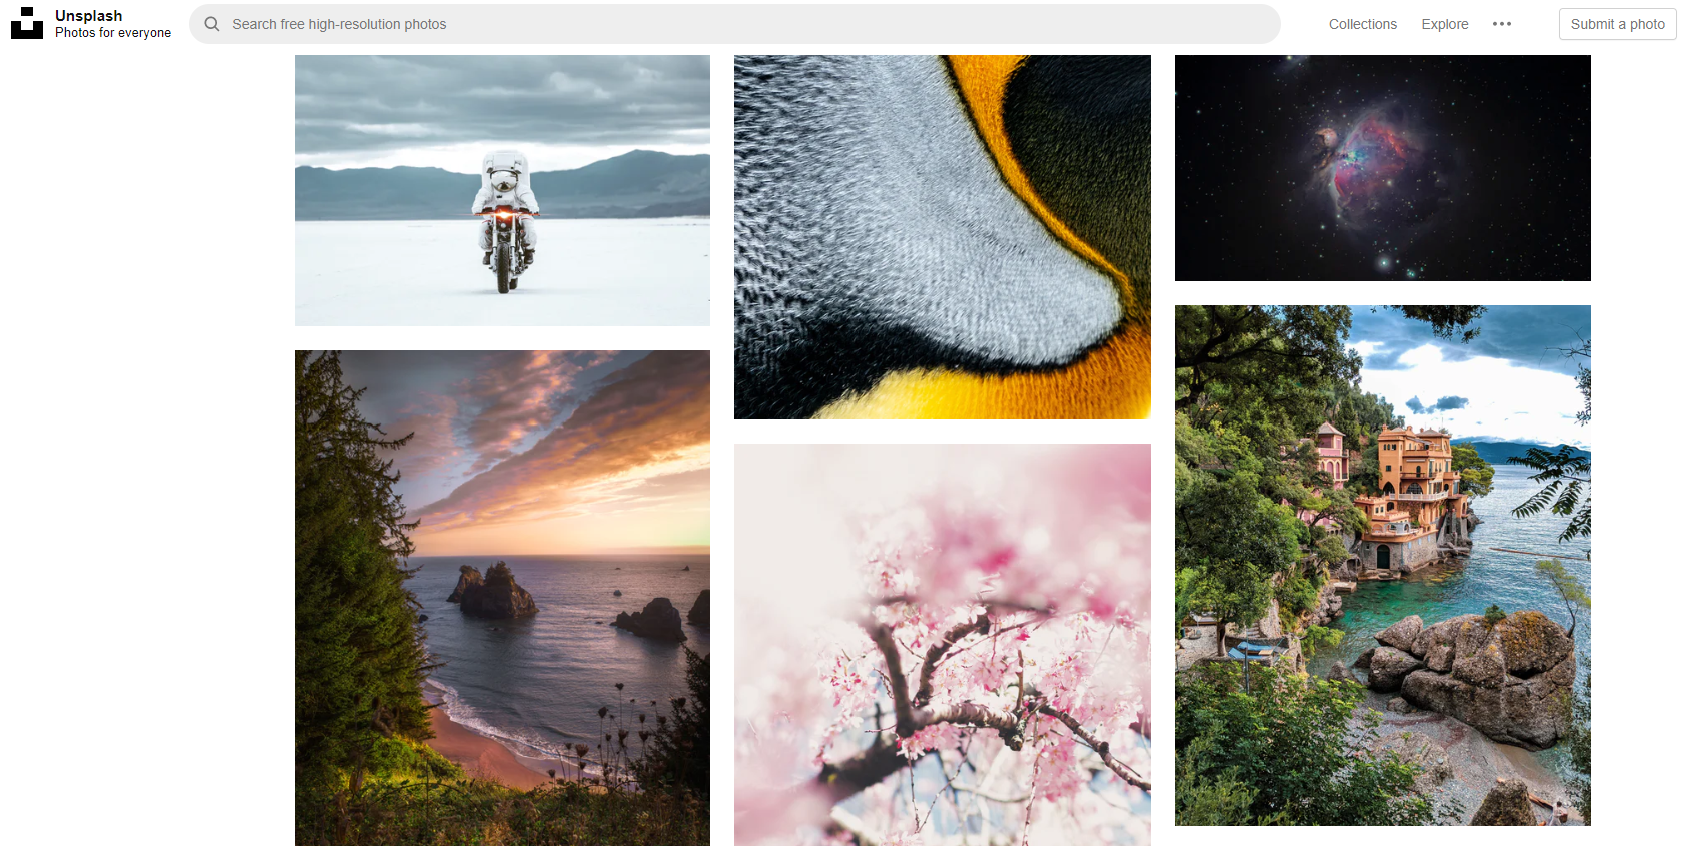 Unsplash stock images